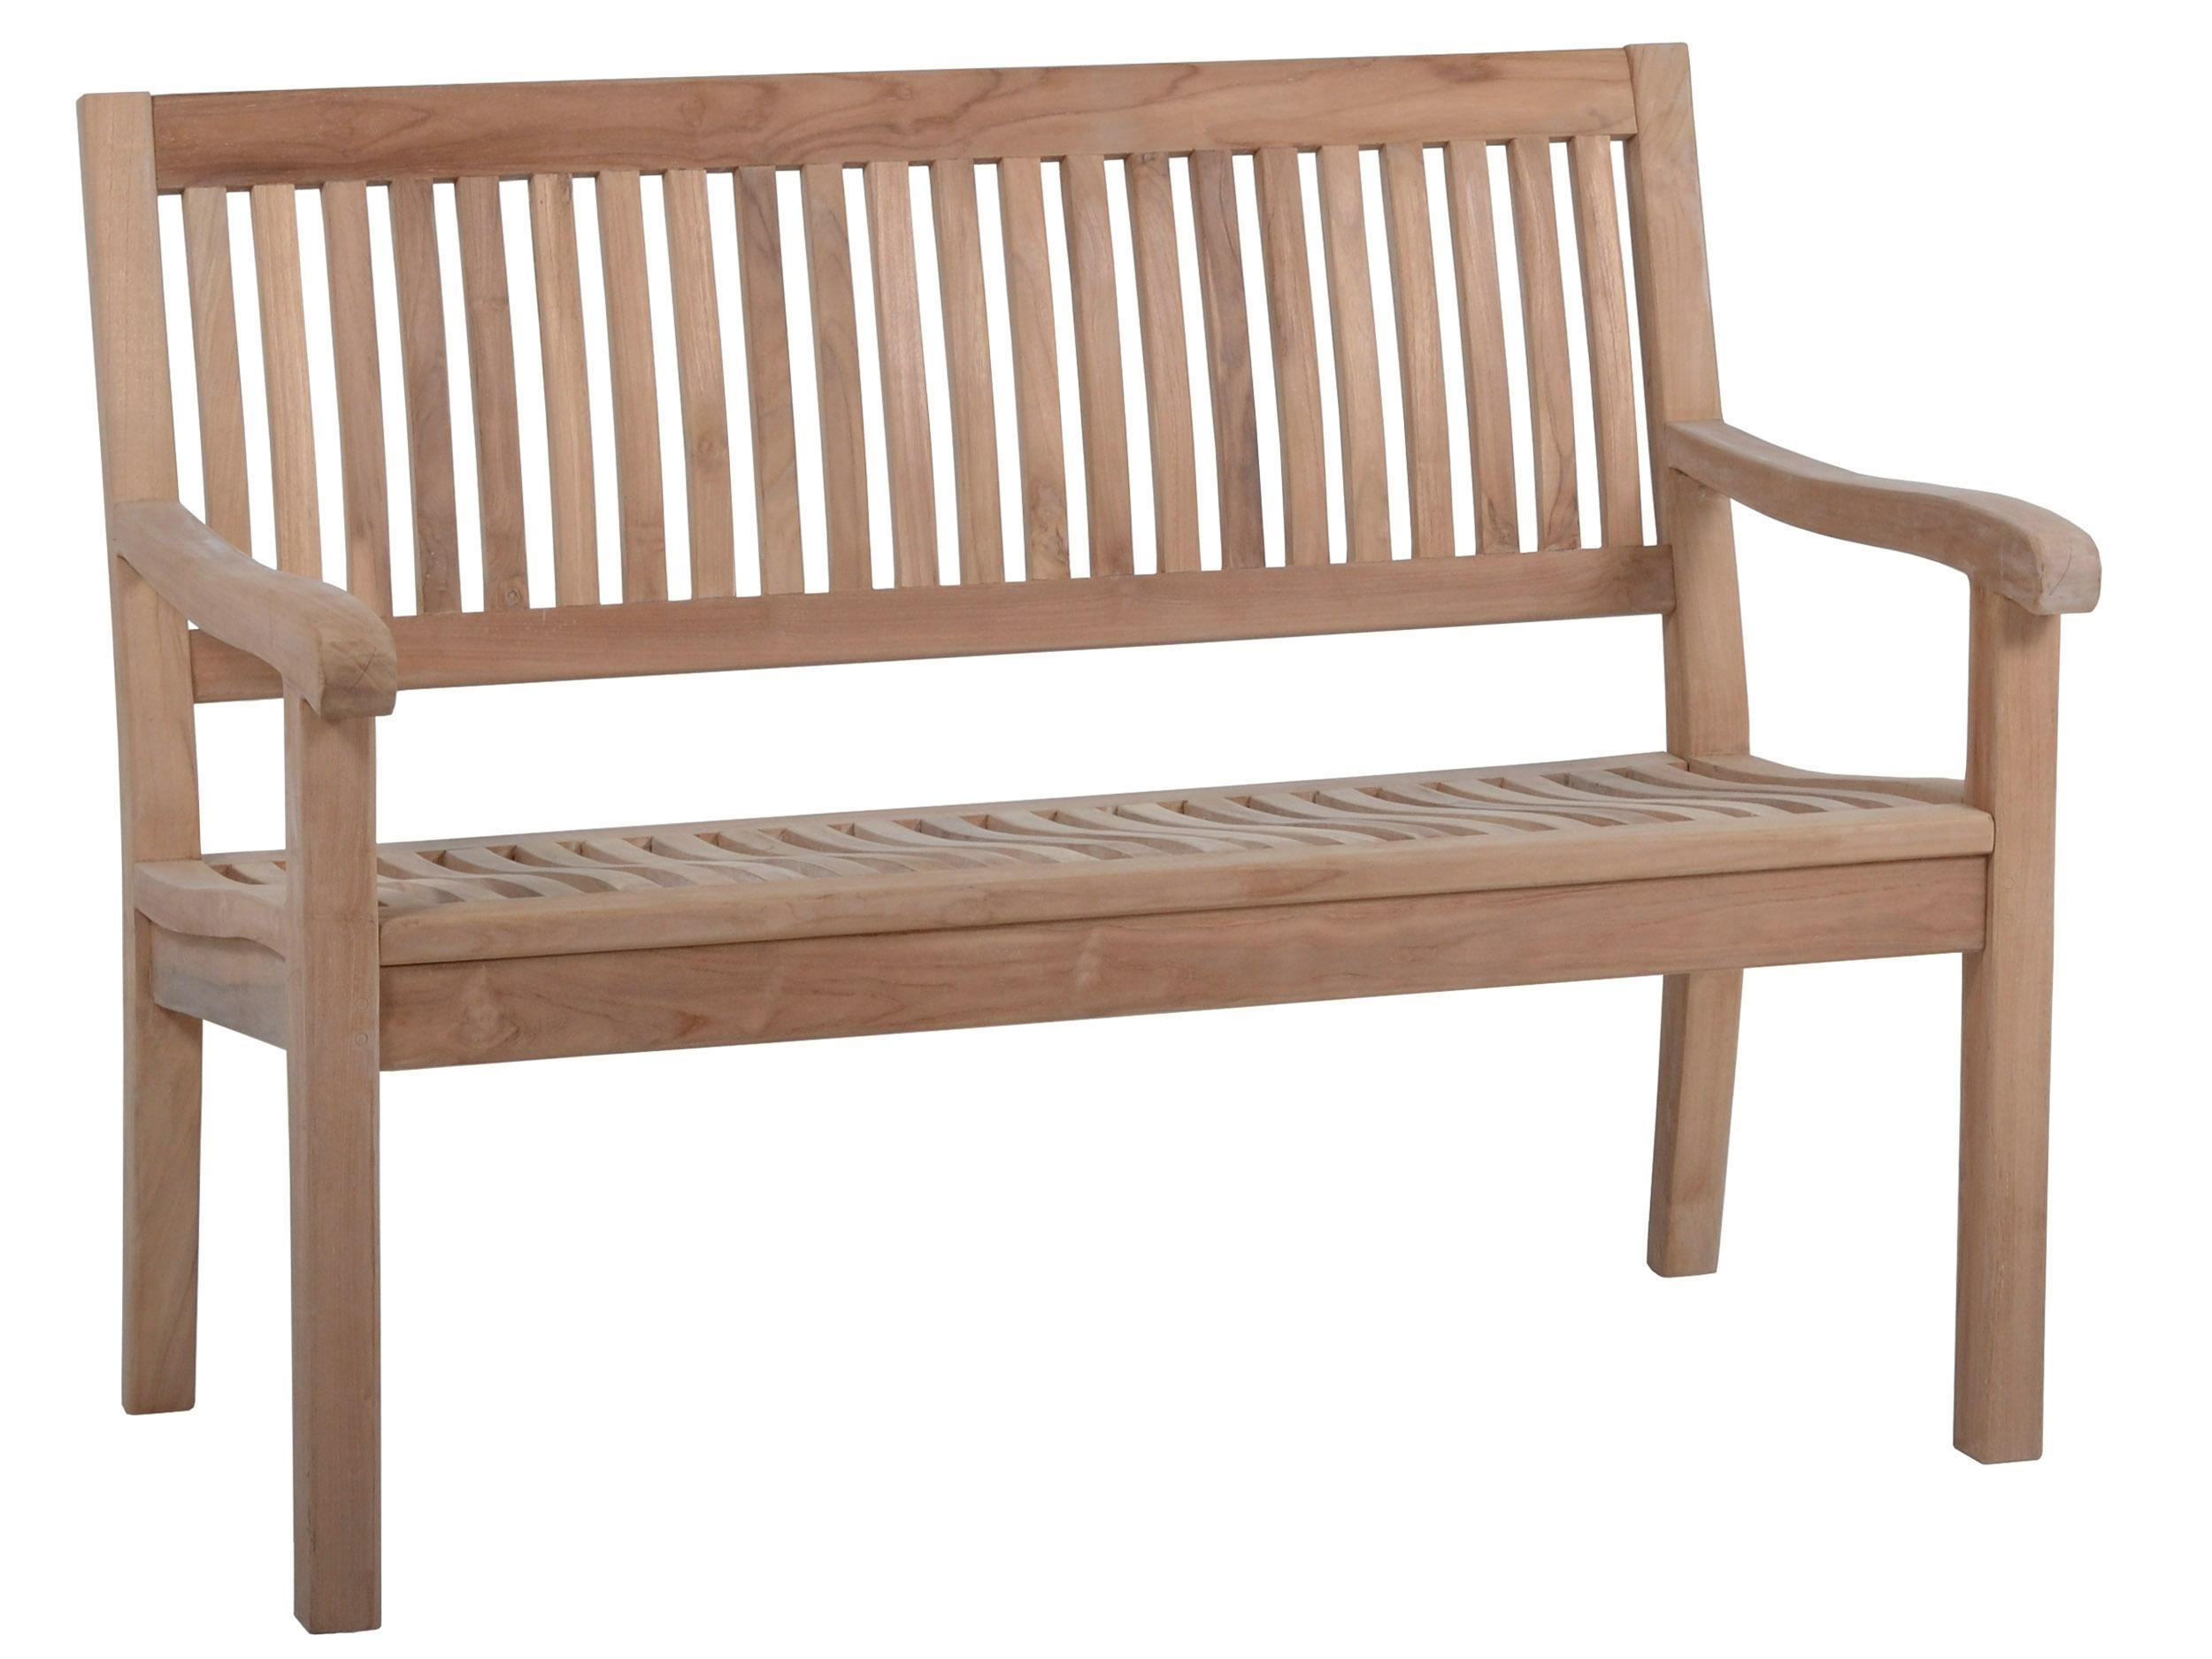 Teakholz Gartenbank Coral 120cm - 2-Sitzer | Gartenmöbel Lünse